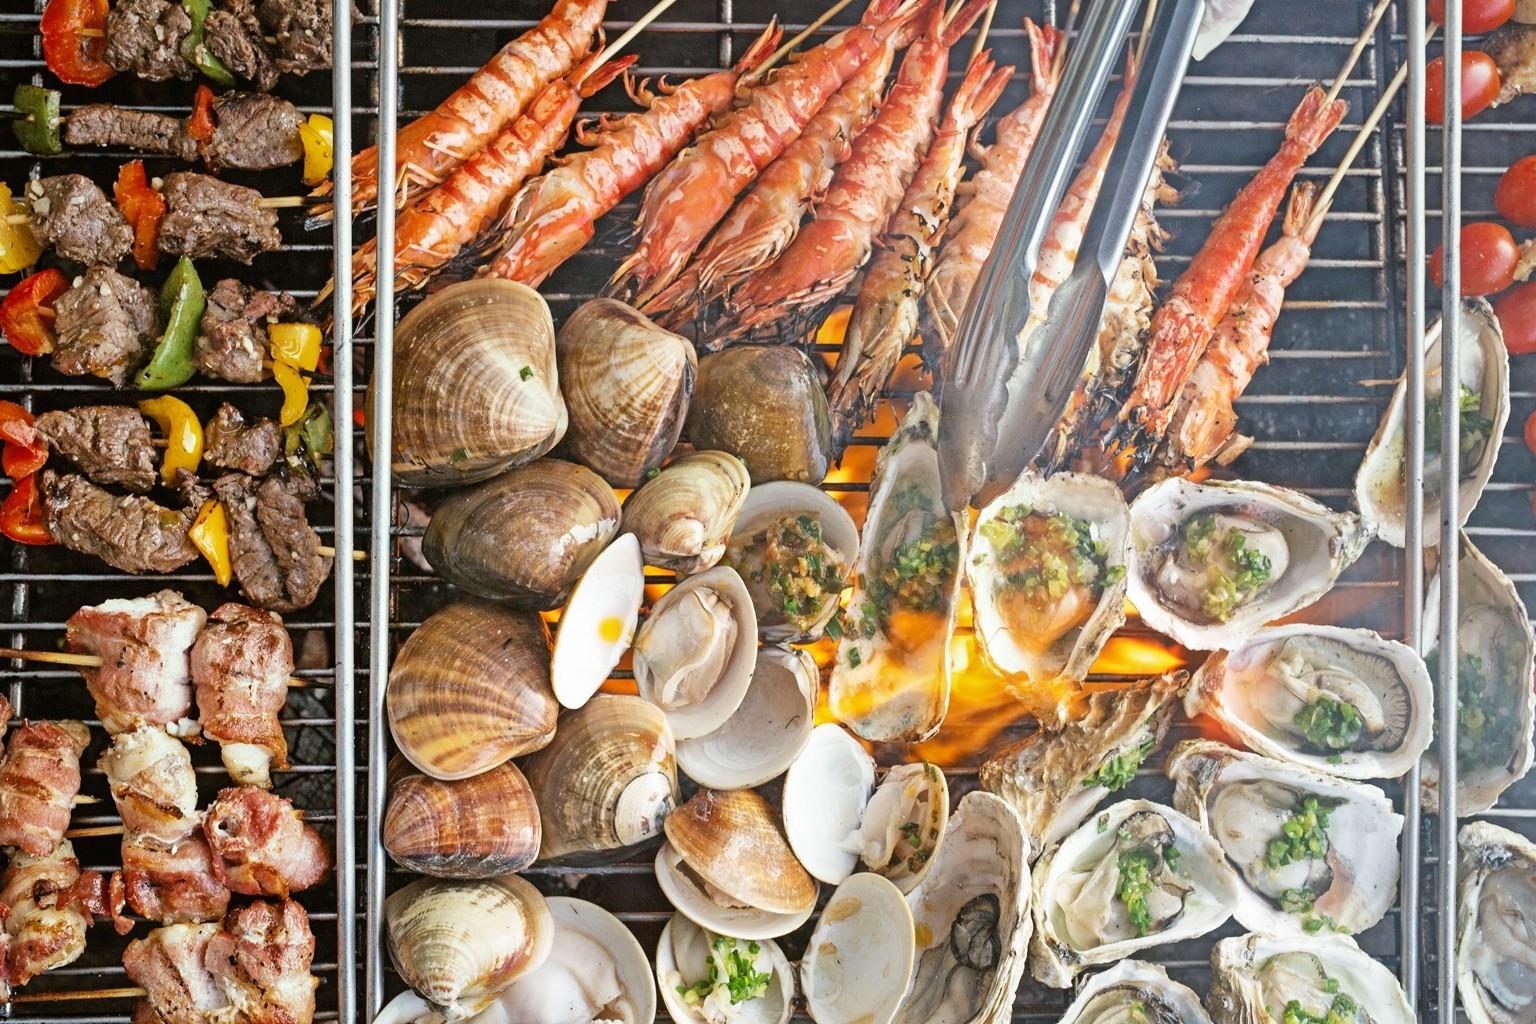 Sunday Beach BBQ BUffet at PUllman Danang Beach Resort Azure Beach Lounge View Luxury